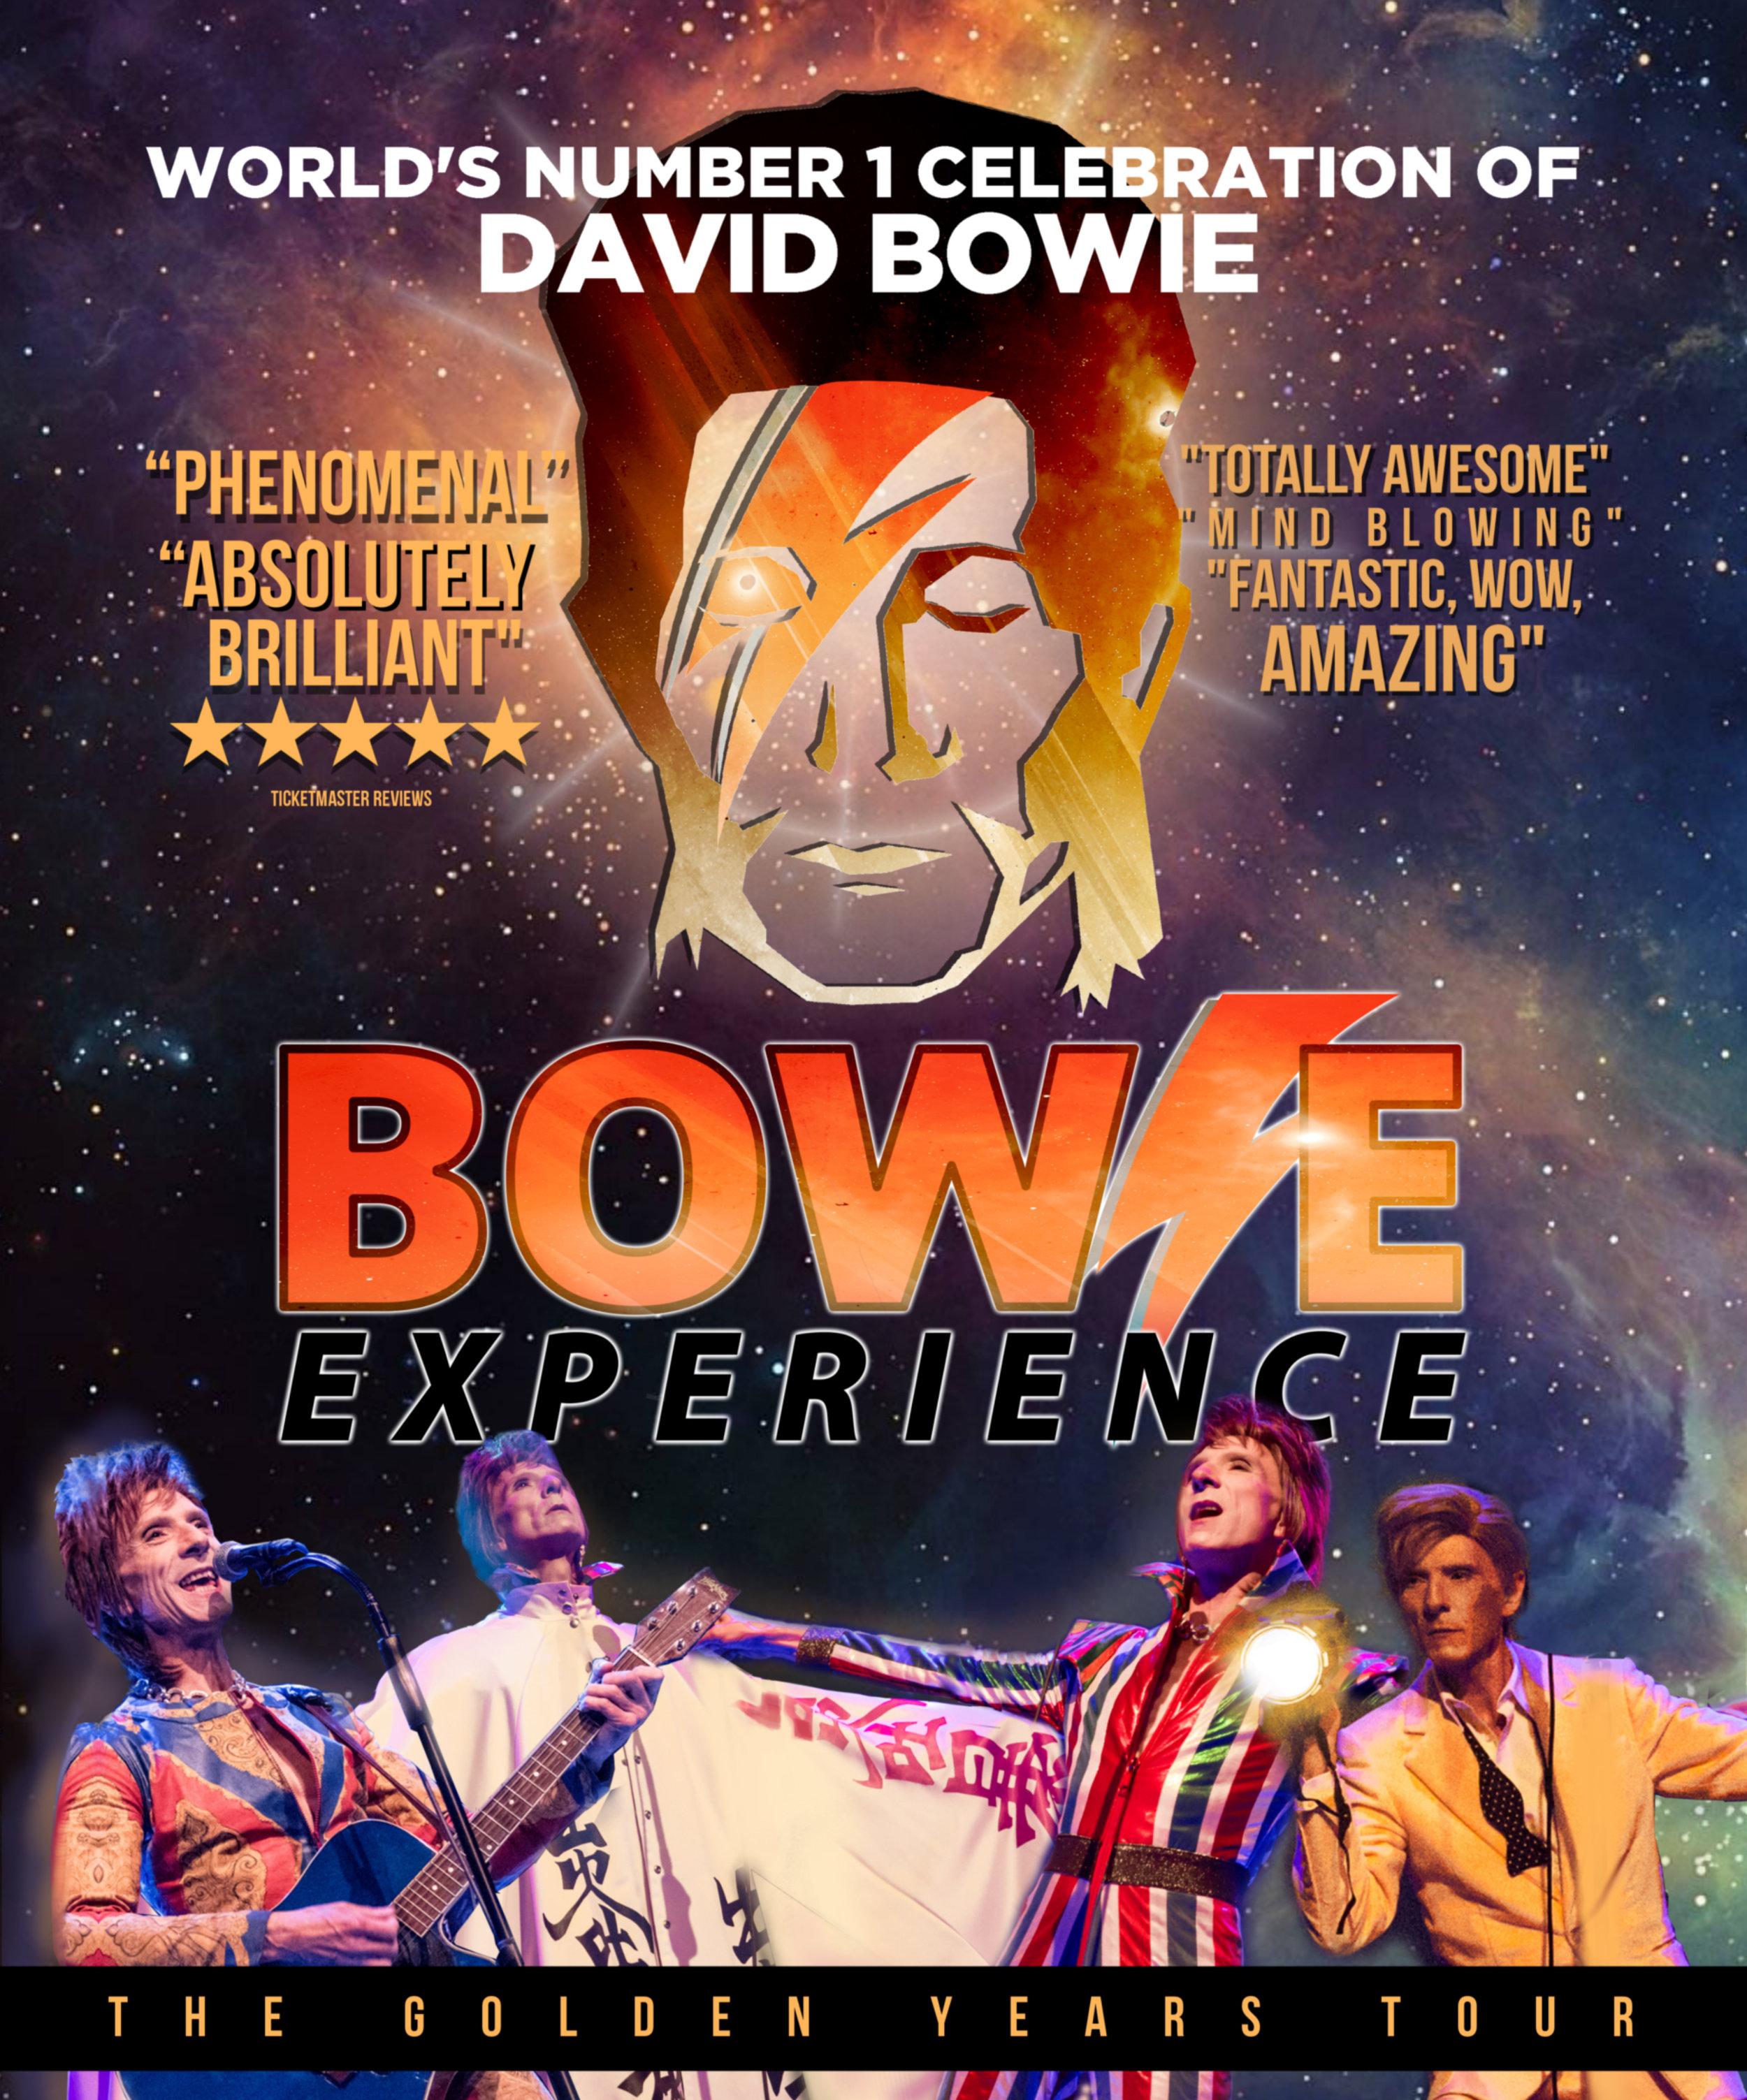 david bowie experience.jpg